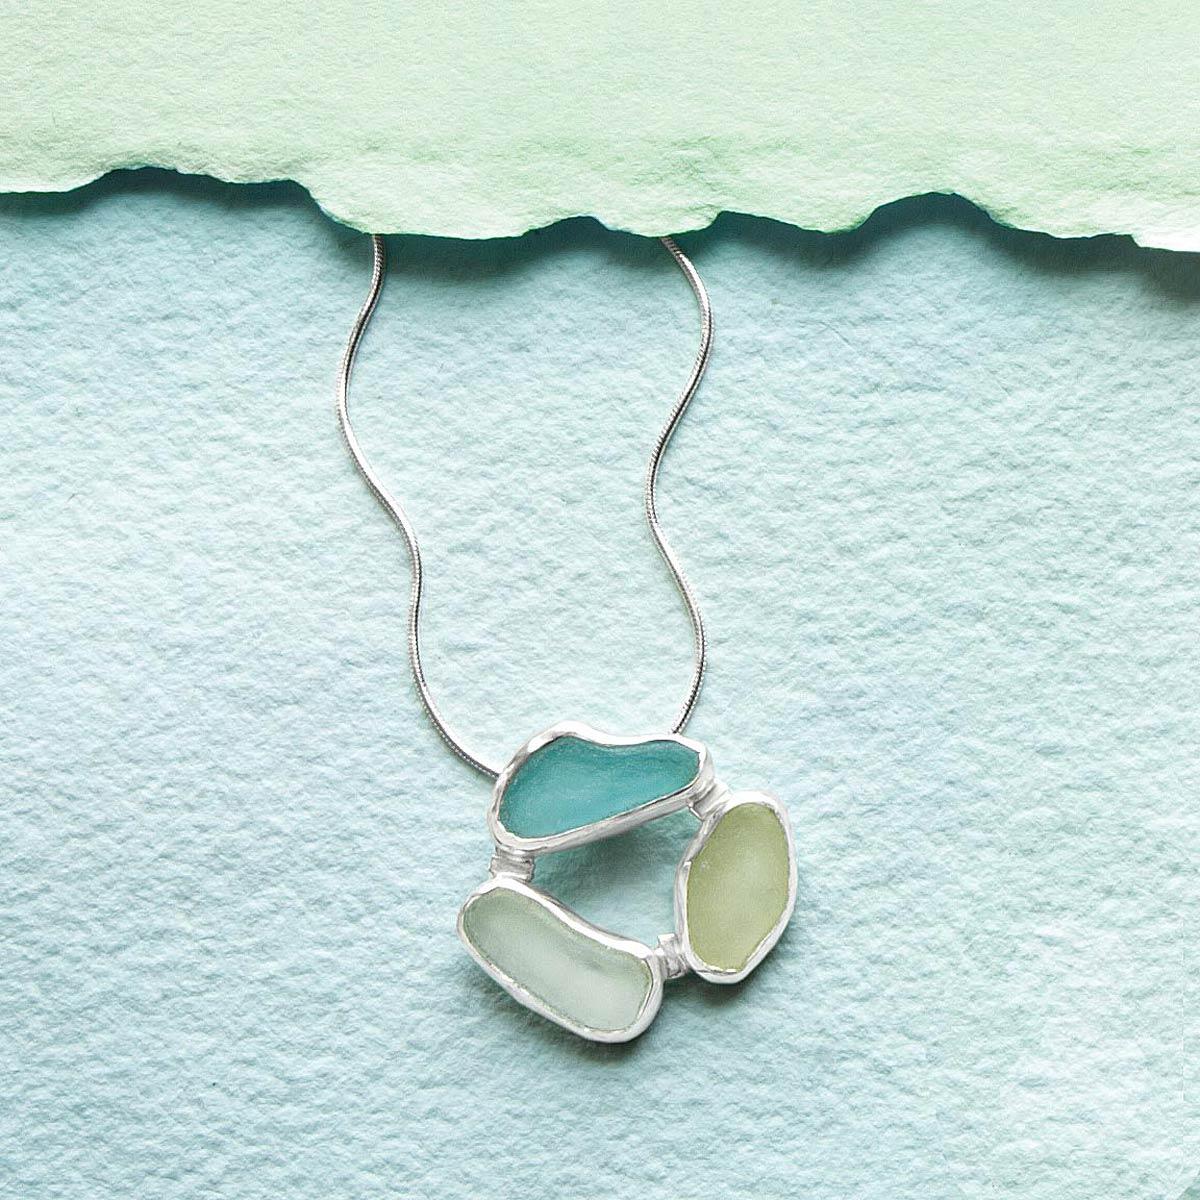 3 Stones Sea Glass Necklace | UncommonGoods